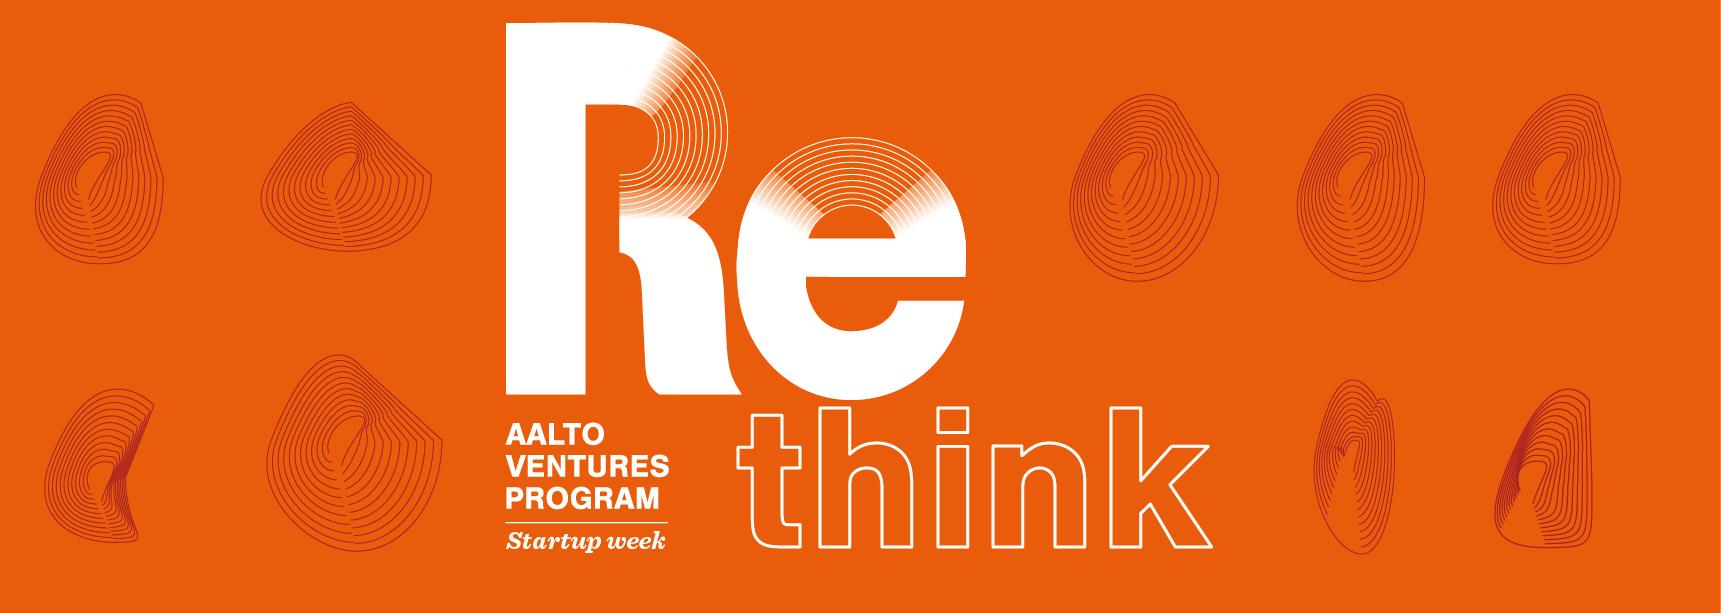 CES-Rethink